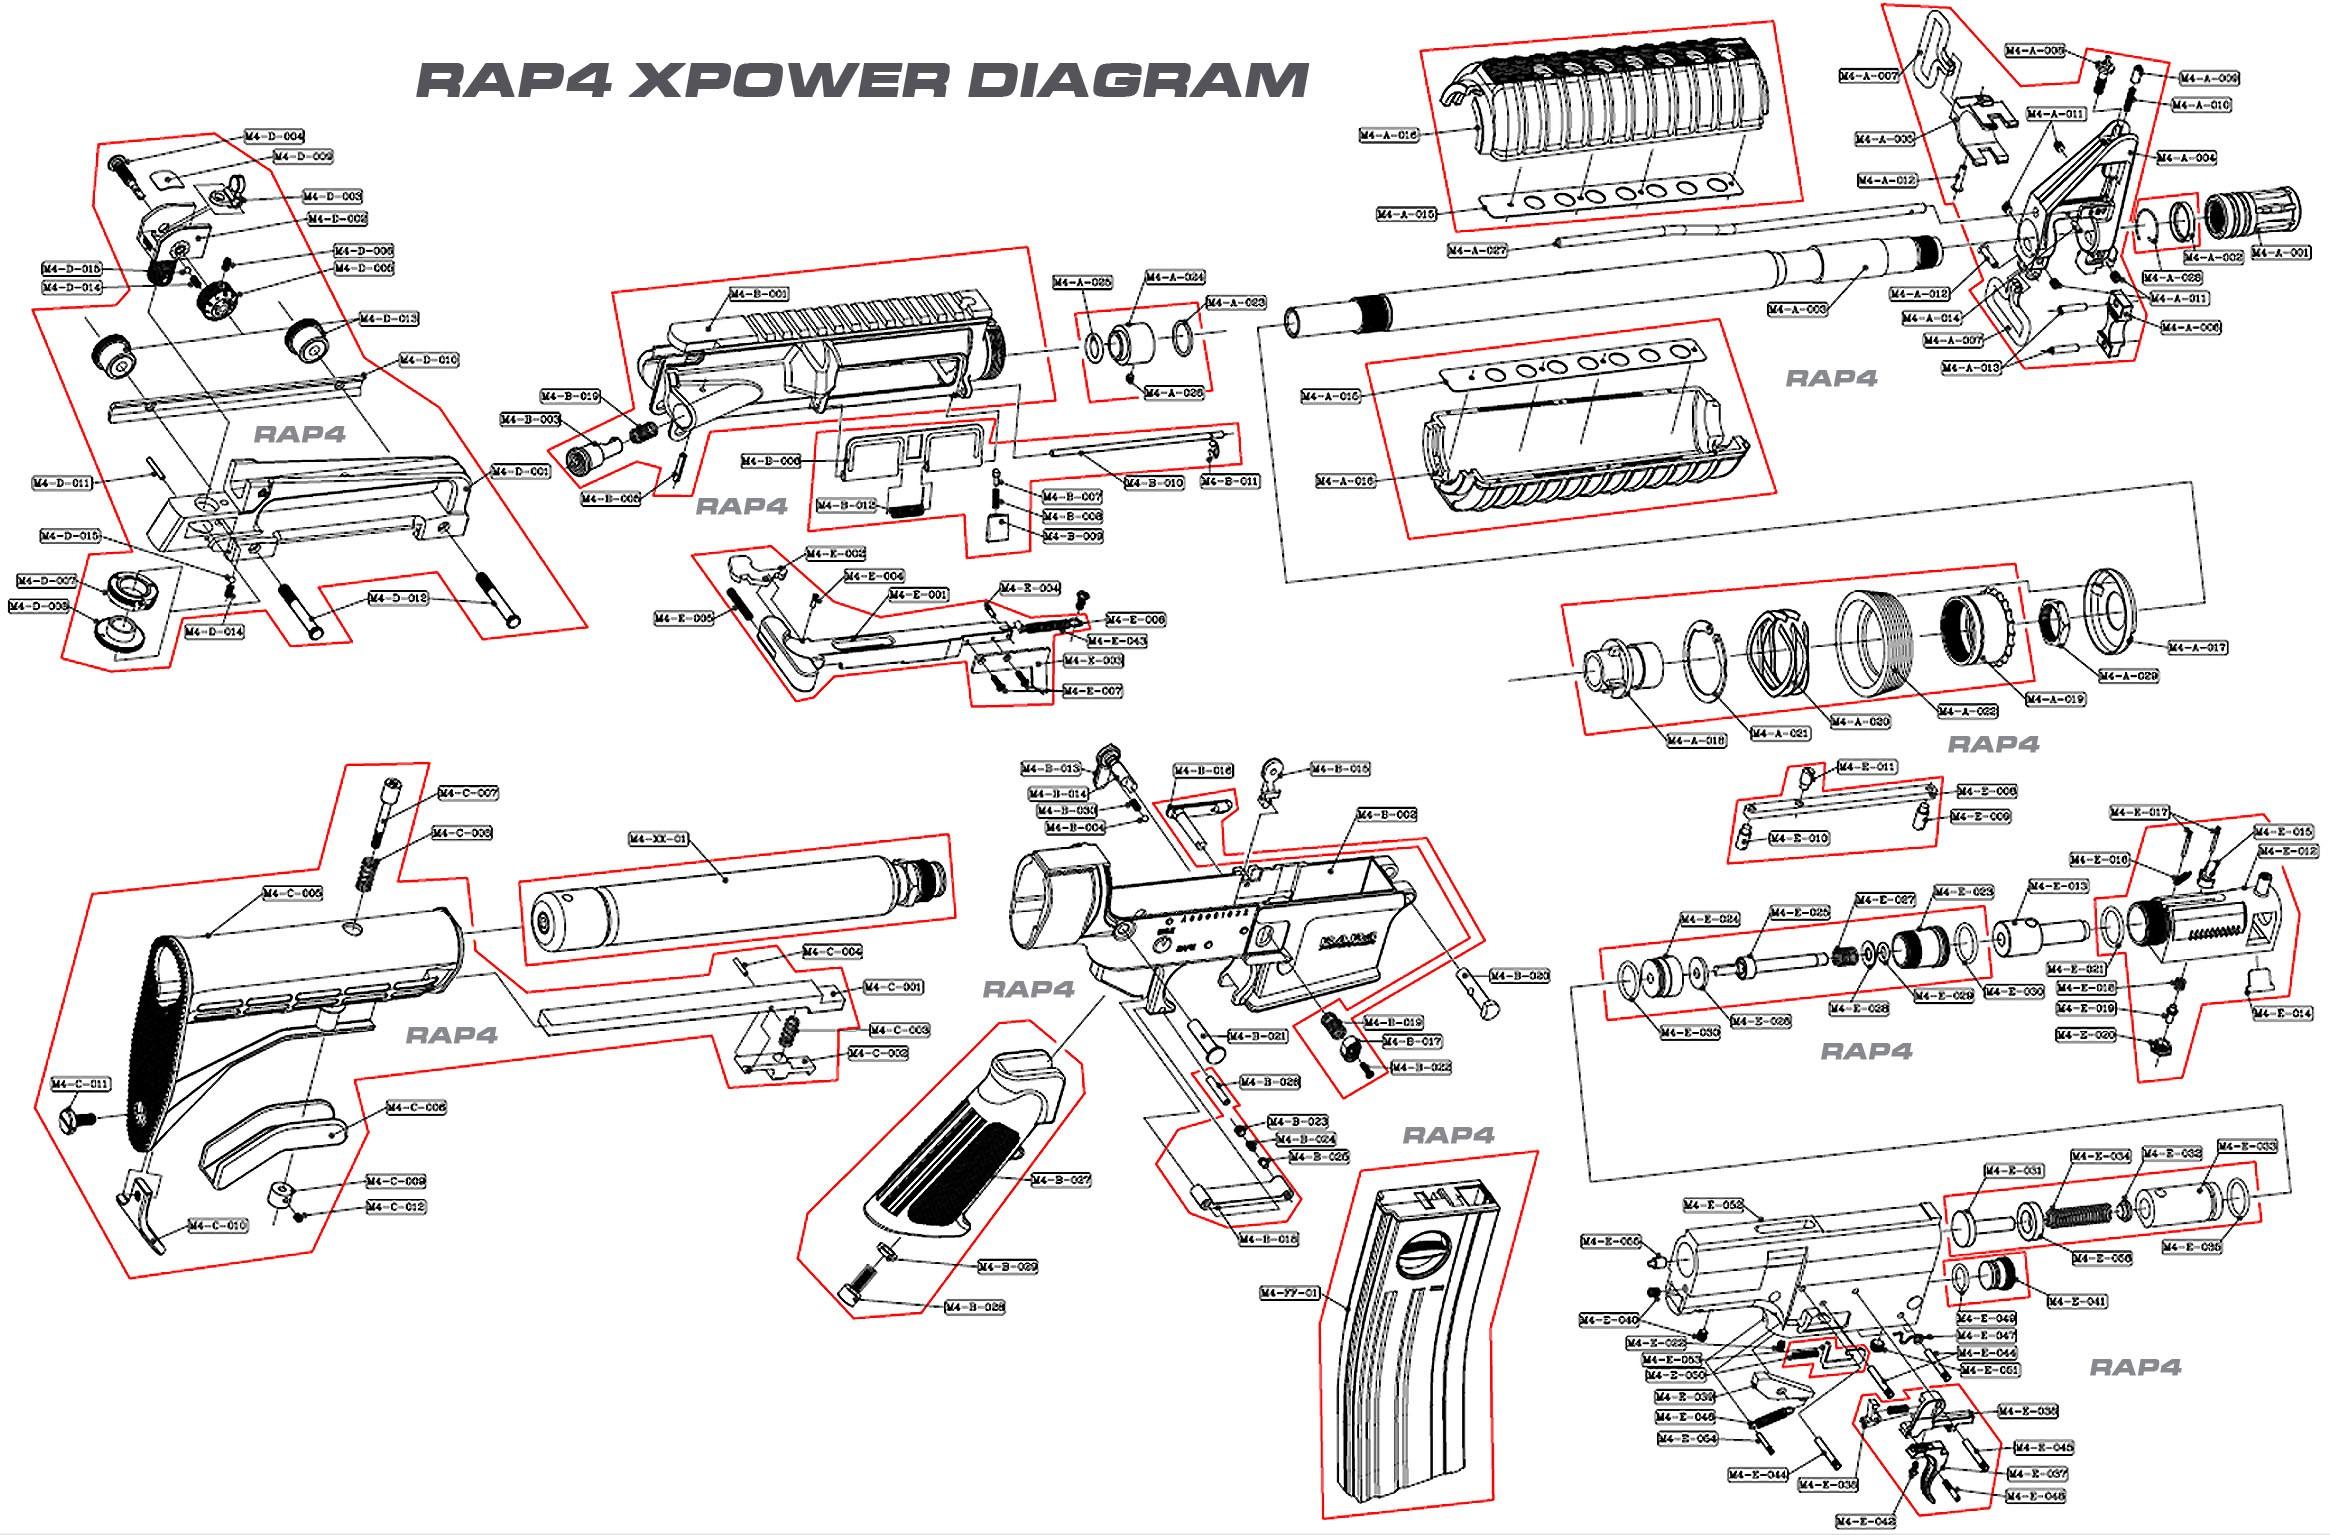 Jeep Engine Parts Diagram 4r100 Transmission Valve Body E4od M4 Carbine Schematic Military Pinterest Of